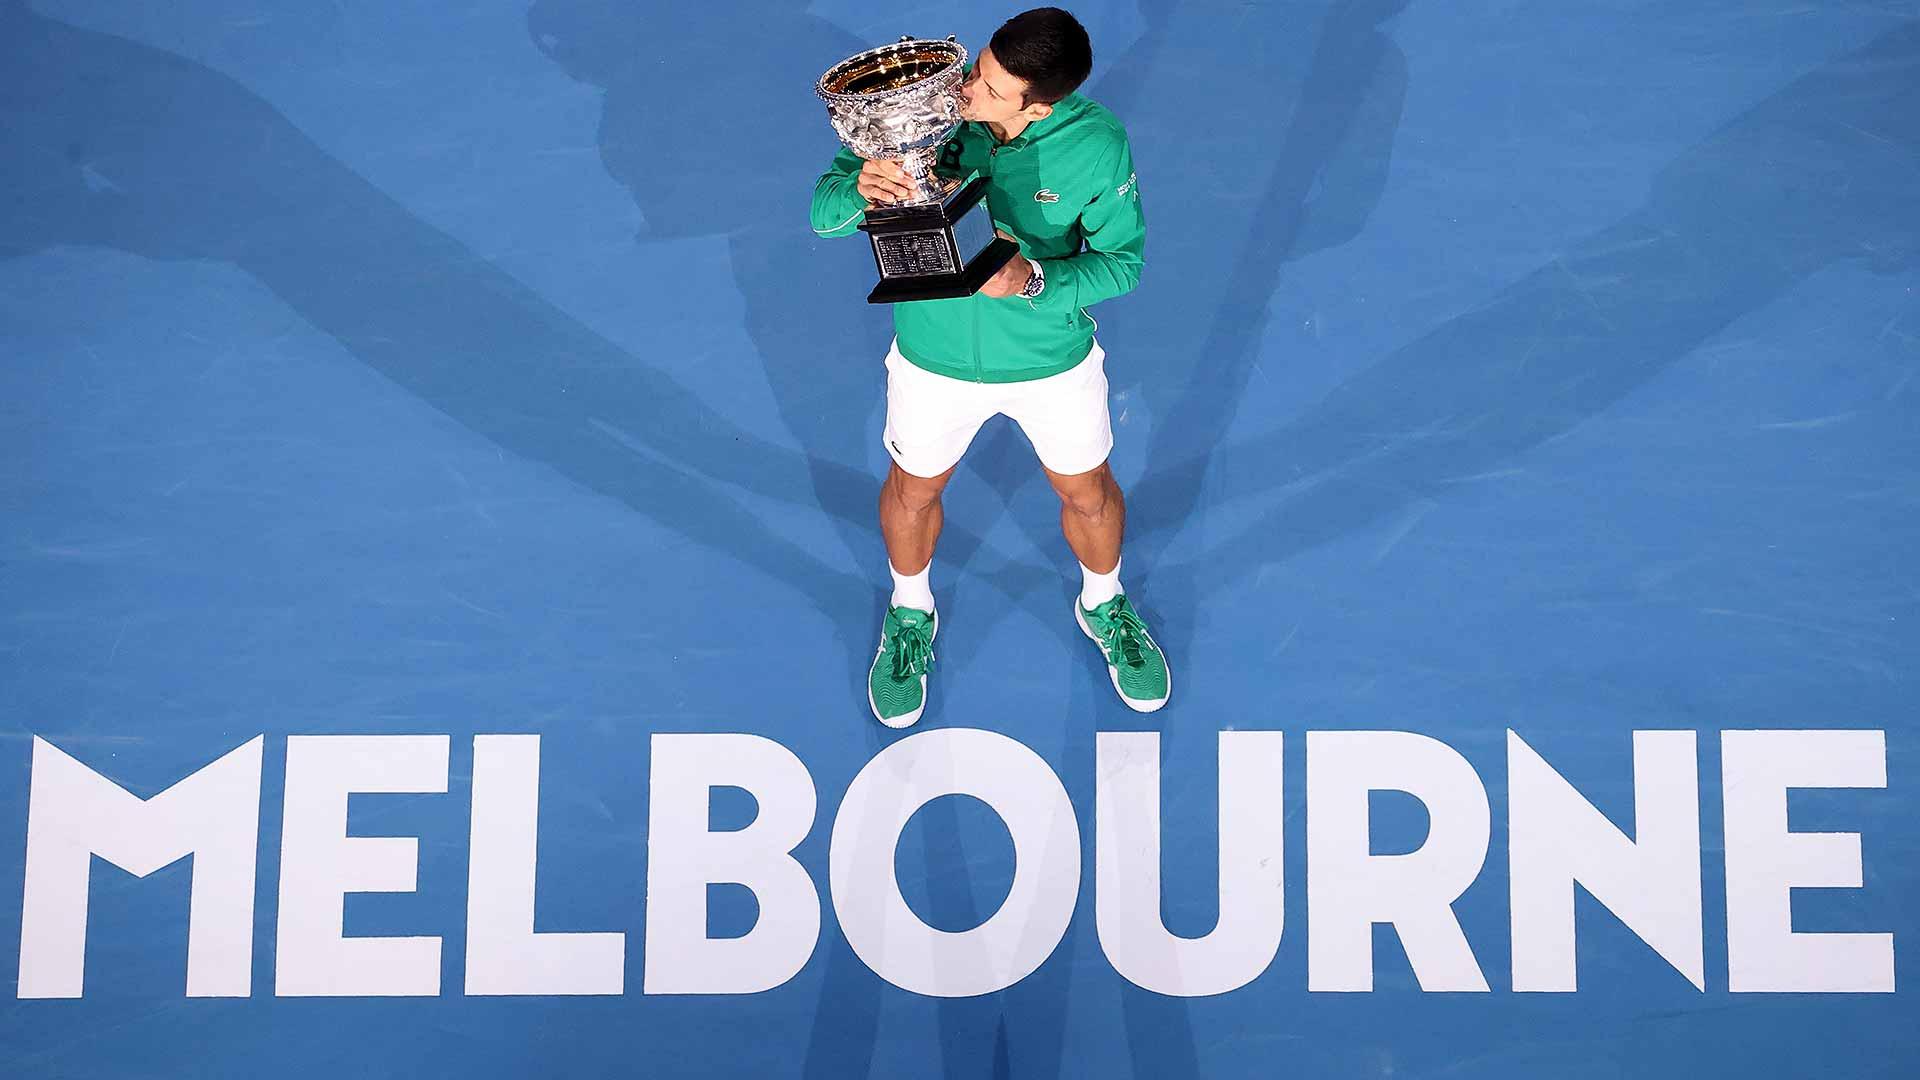 Social Media Reacts To Djokovic Winning Eighth Australian Open Title Atp Tour Tennis